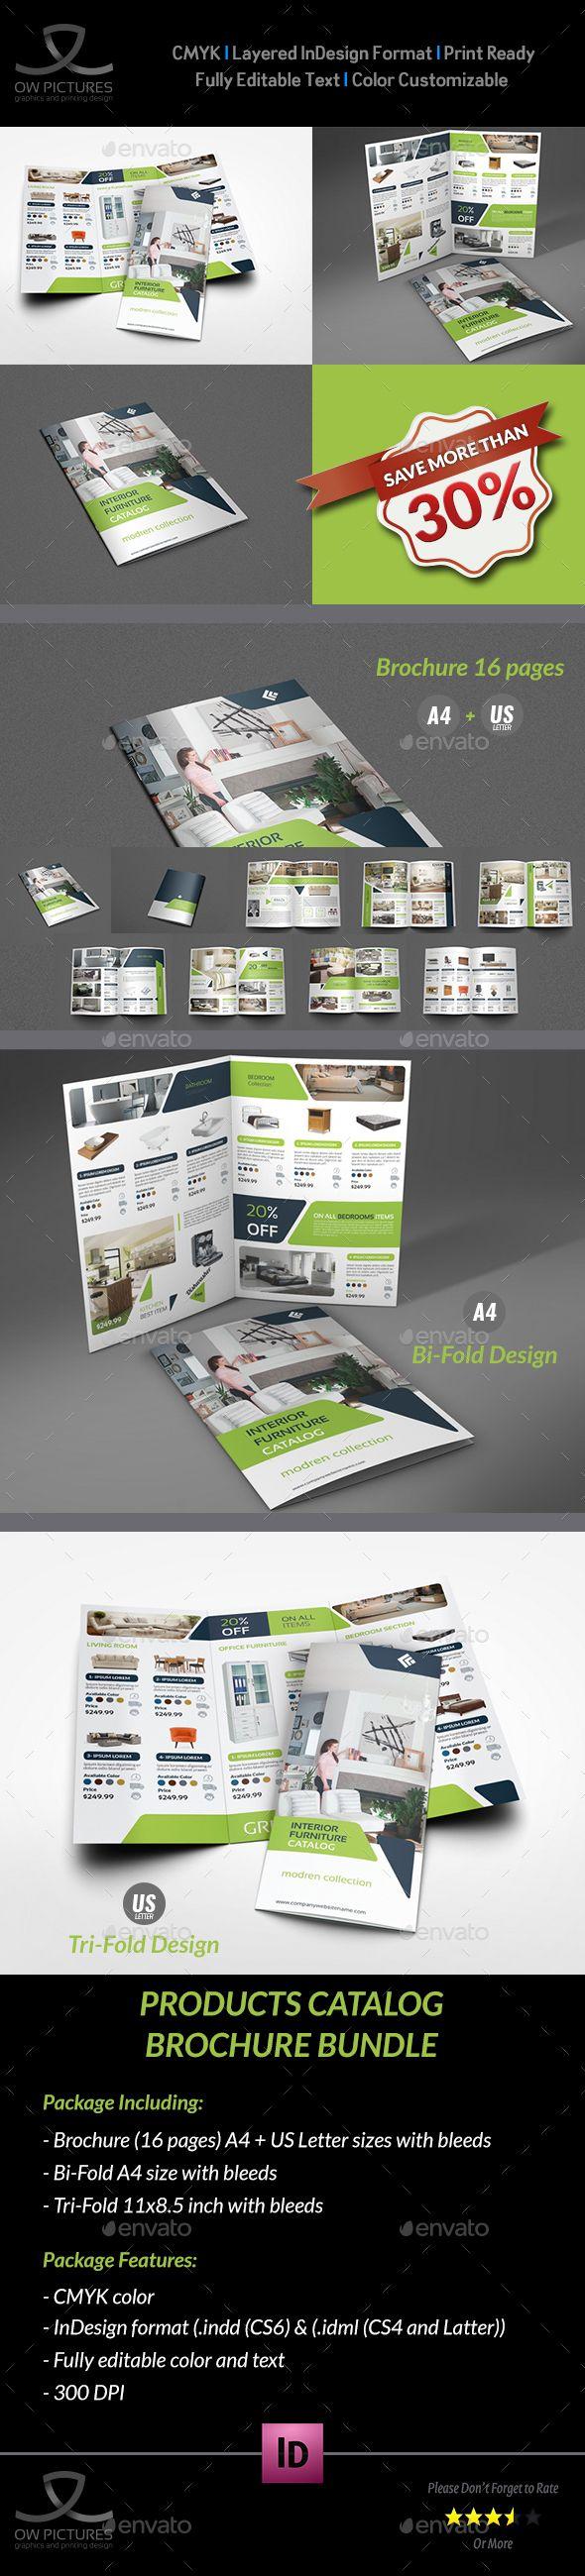 103 best PRODUCT CATALOG images on Pinterest | Product catalog, Ads ...